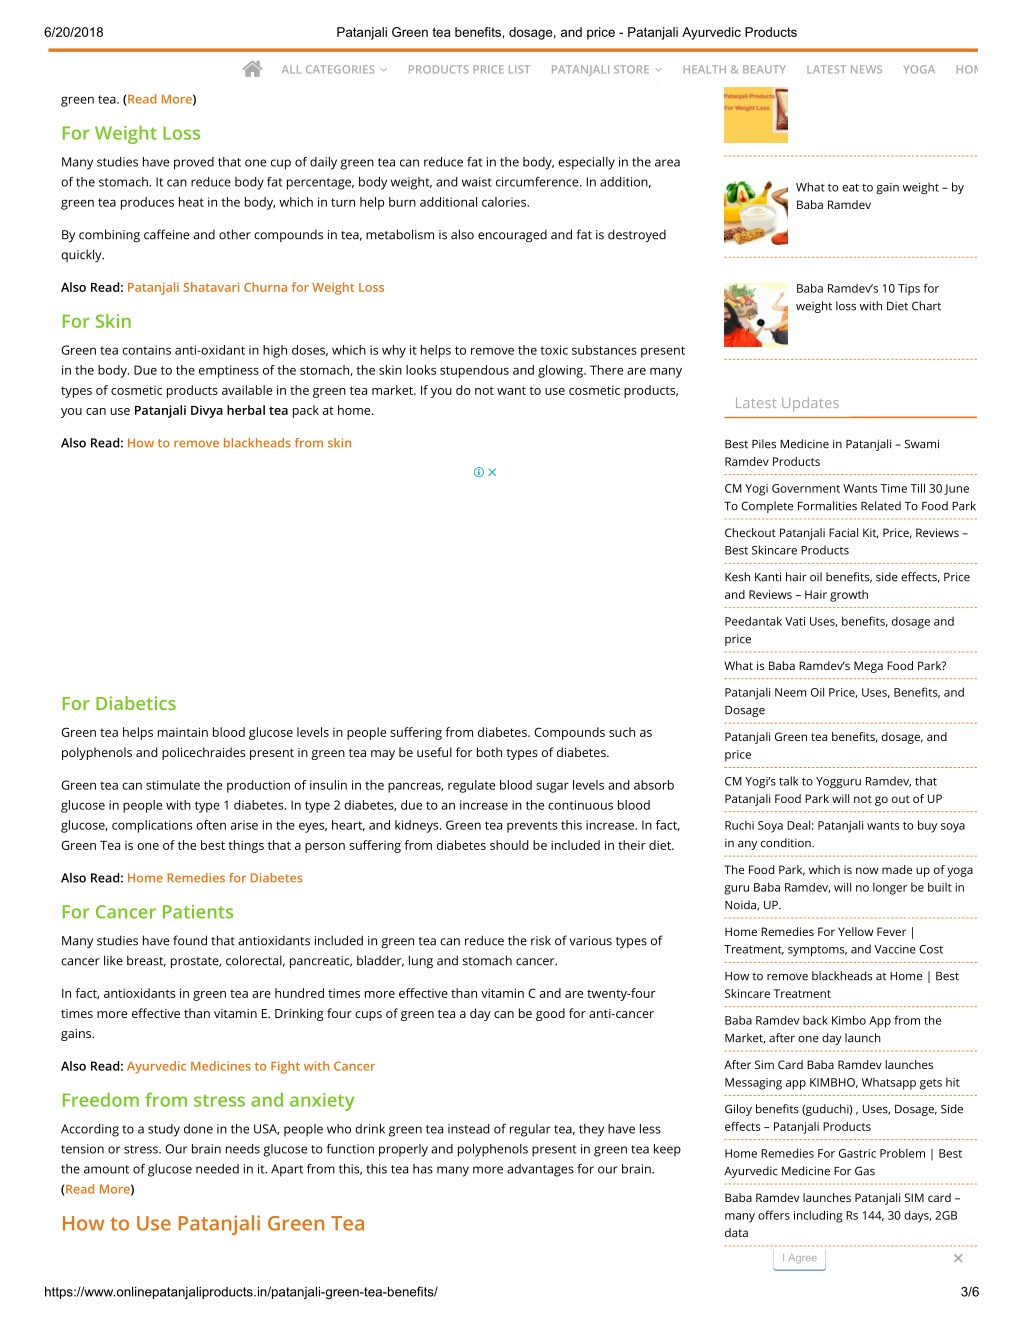 PPT - Patanjali Green tea benefits, dosage, and price - Patanjali